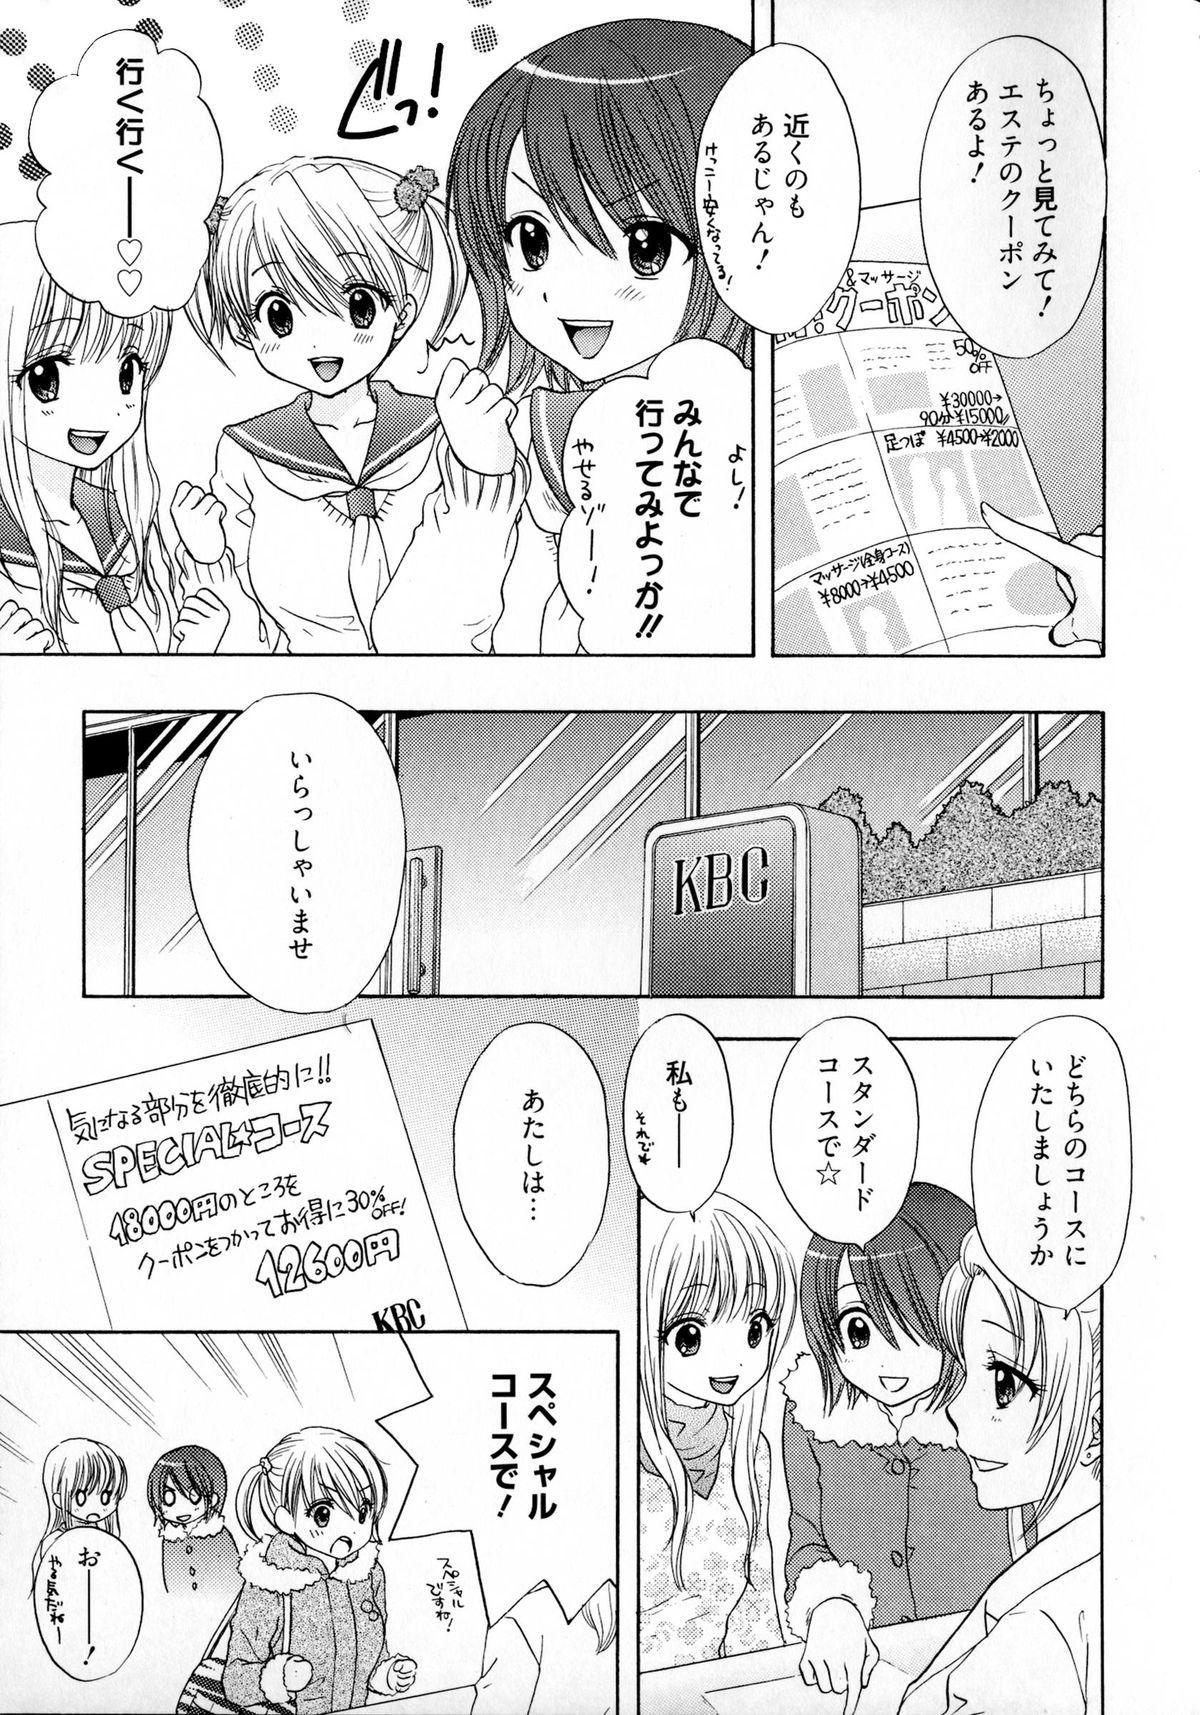 The Great Escape 4 Shokai Genteiban 38